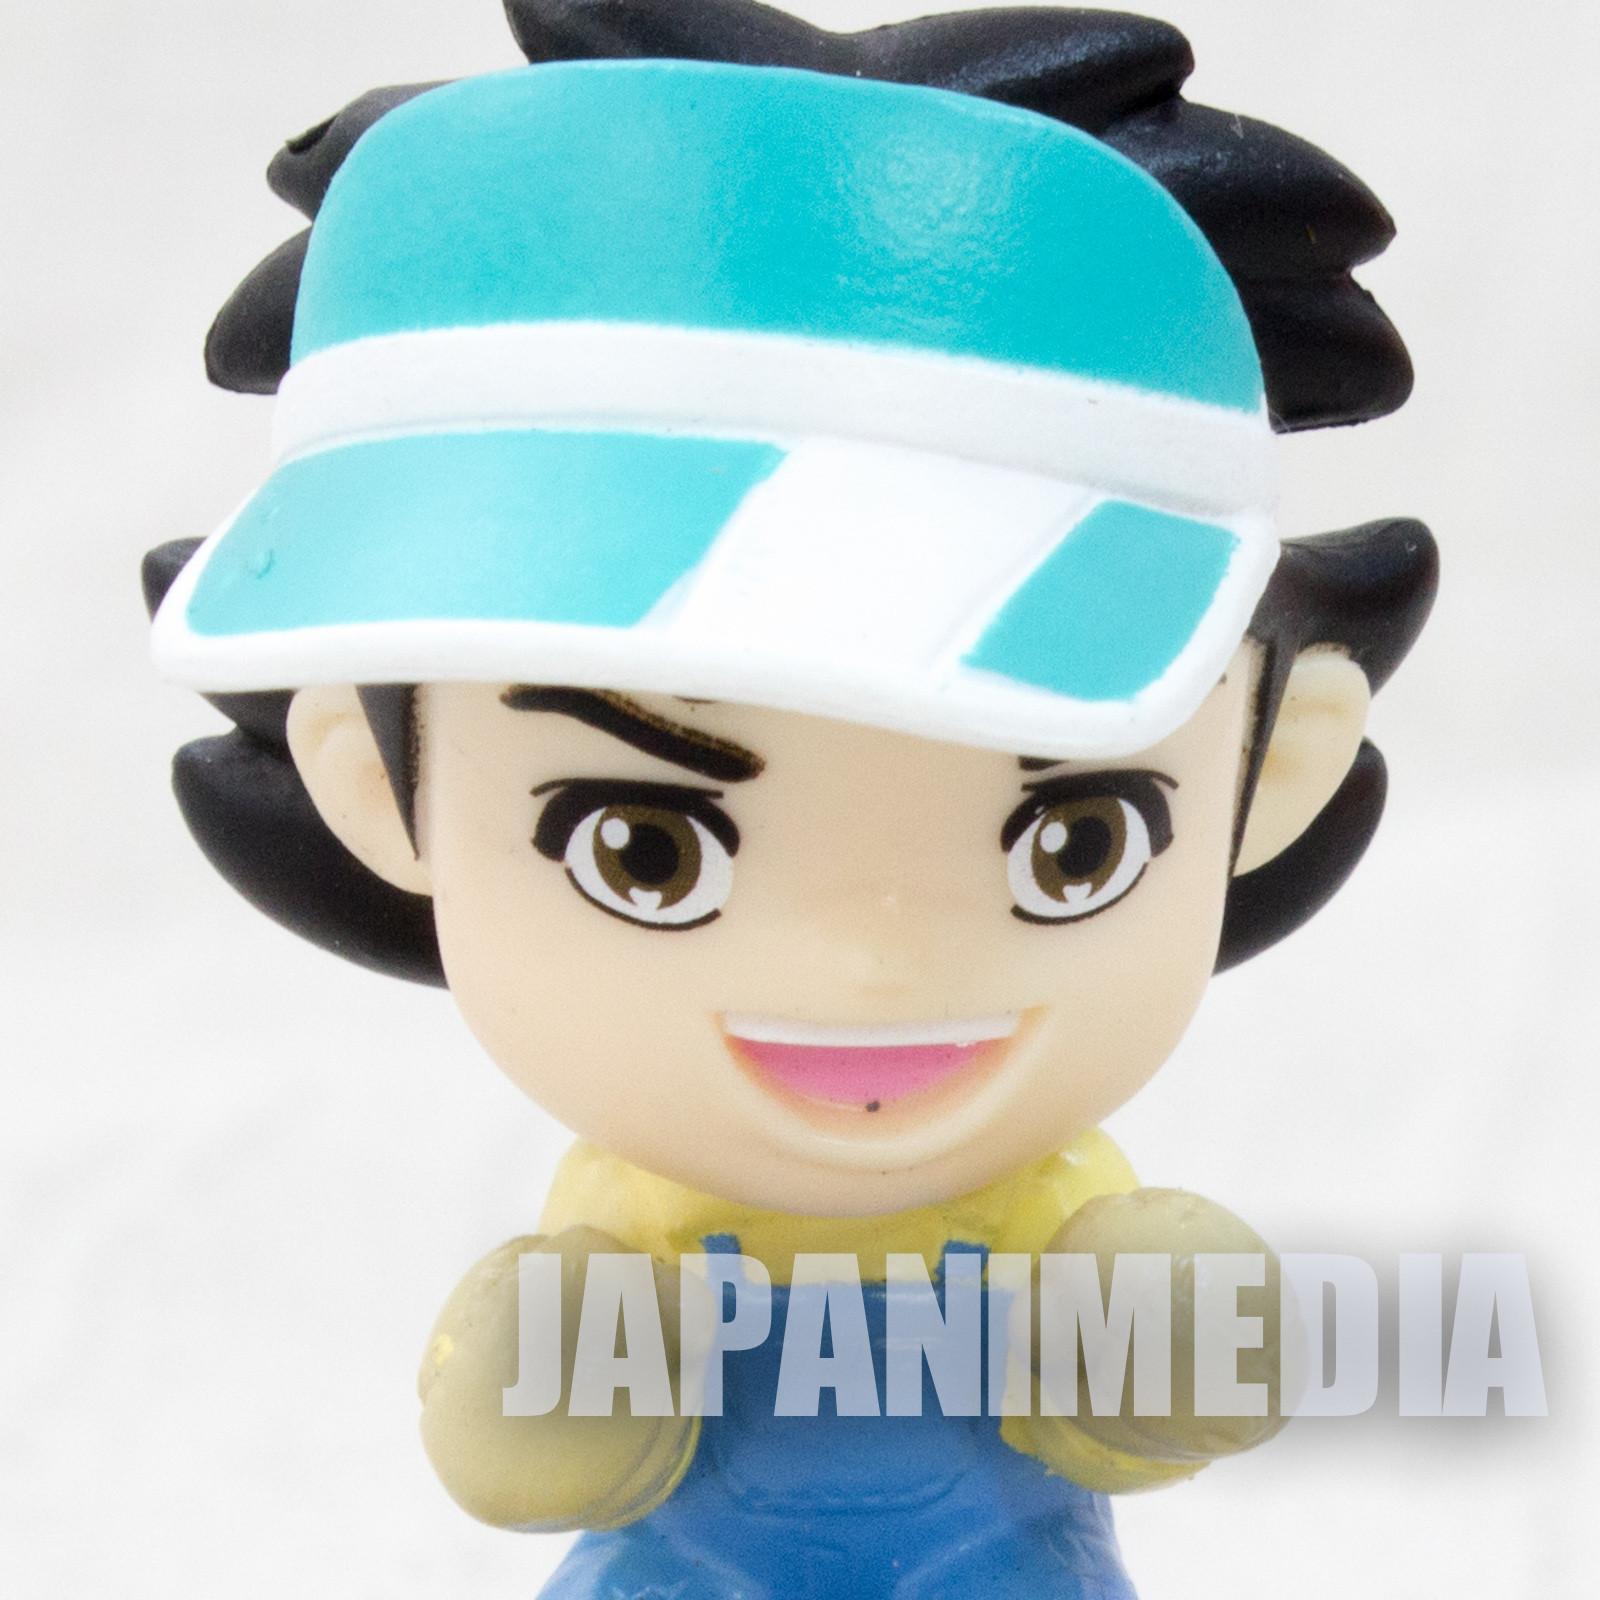 Ganbare Genki Horiguchi Genki Bobbin Head Figure Toy Full JAPAN ANIME